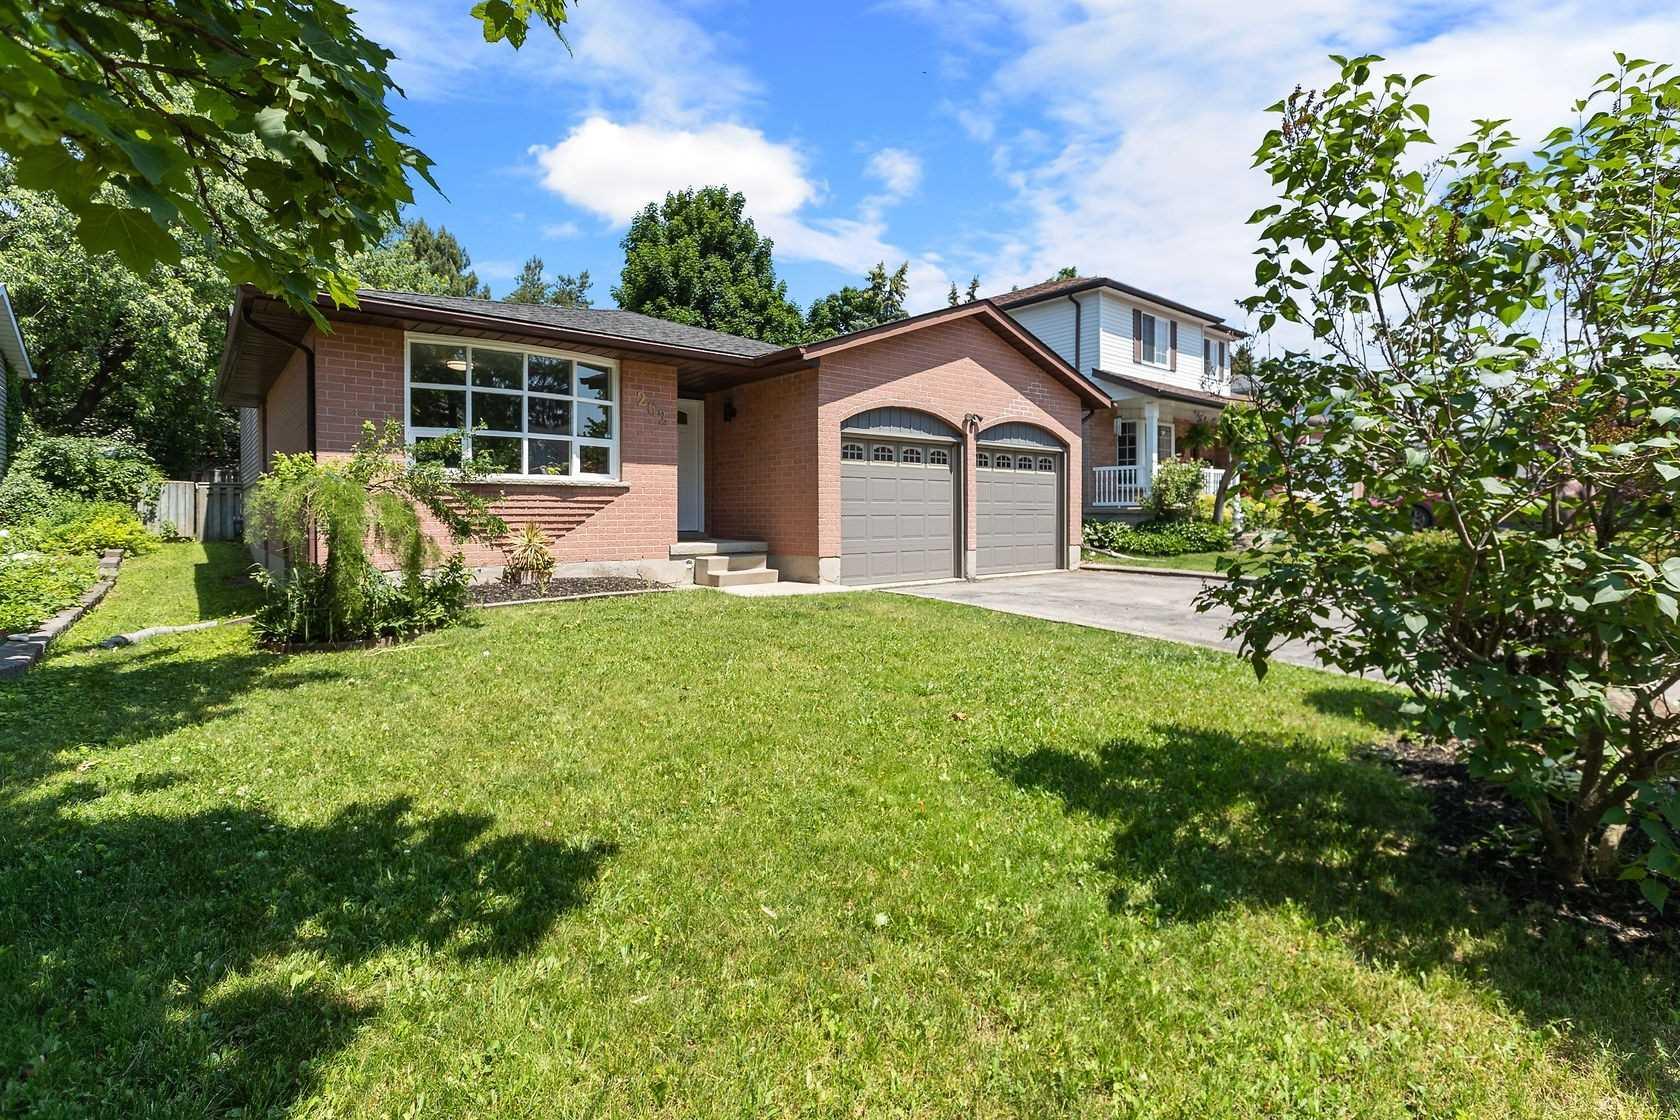 262 Tagge Cres, Kitchener, Ontario N2K 3R7, 3 Bedrooms Bedrooms, ,3 BathroomsBathrooms,Detached,For Sale,Tagge,X5272977